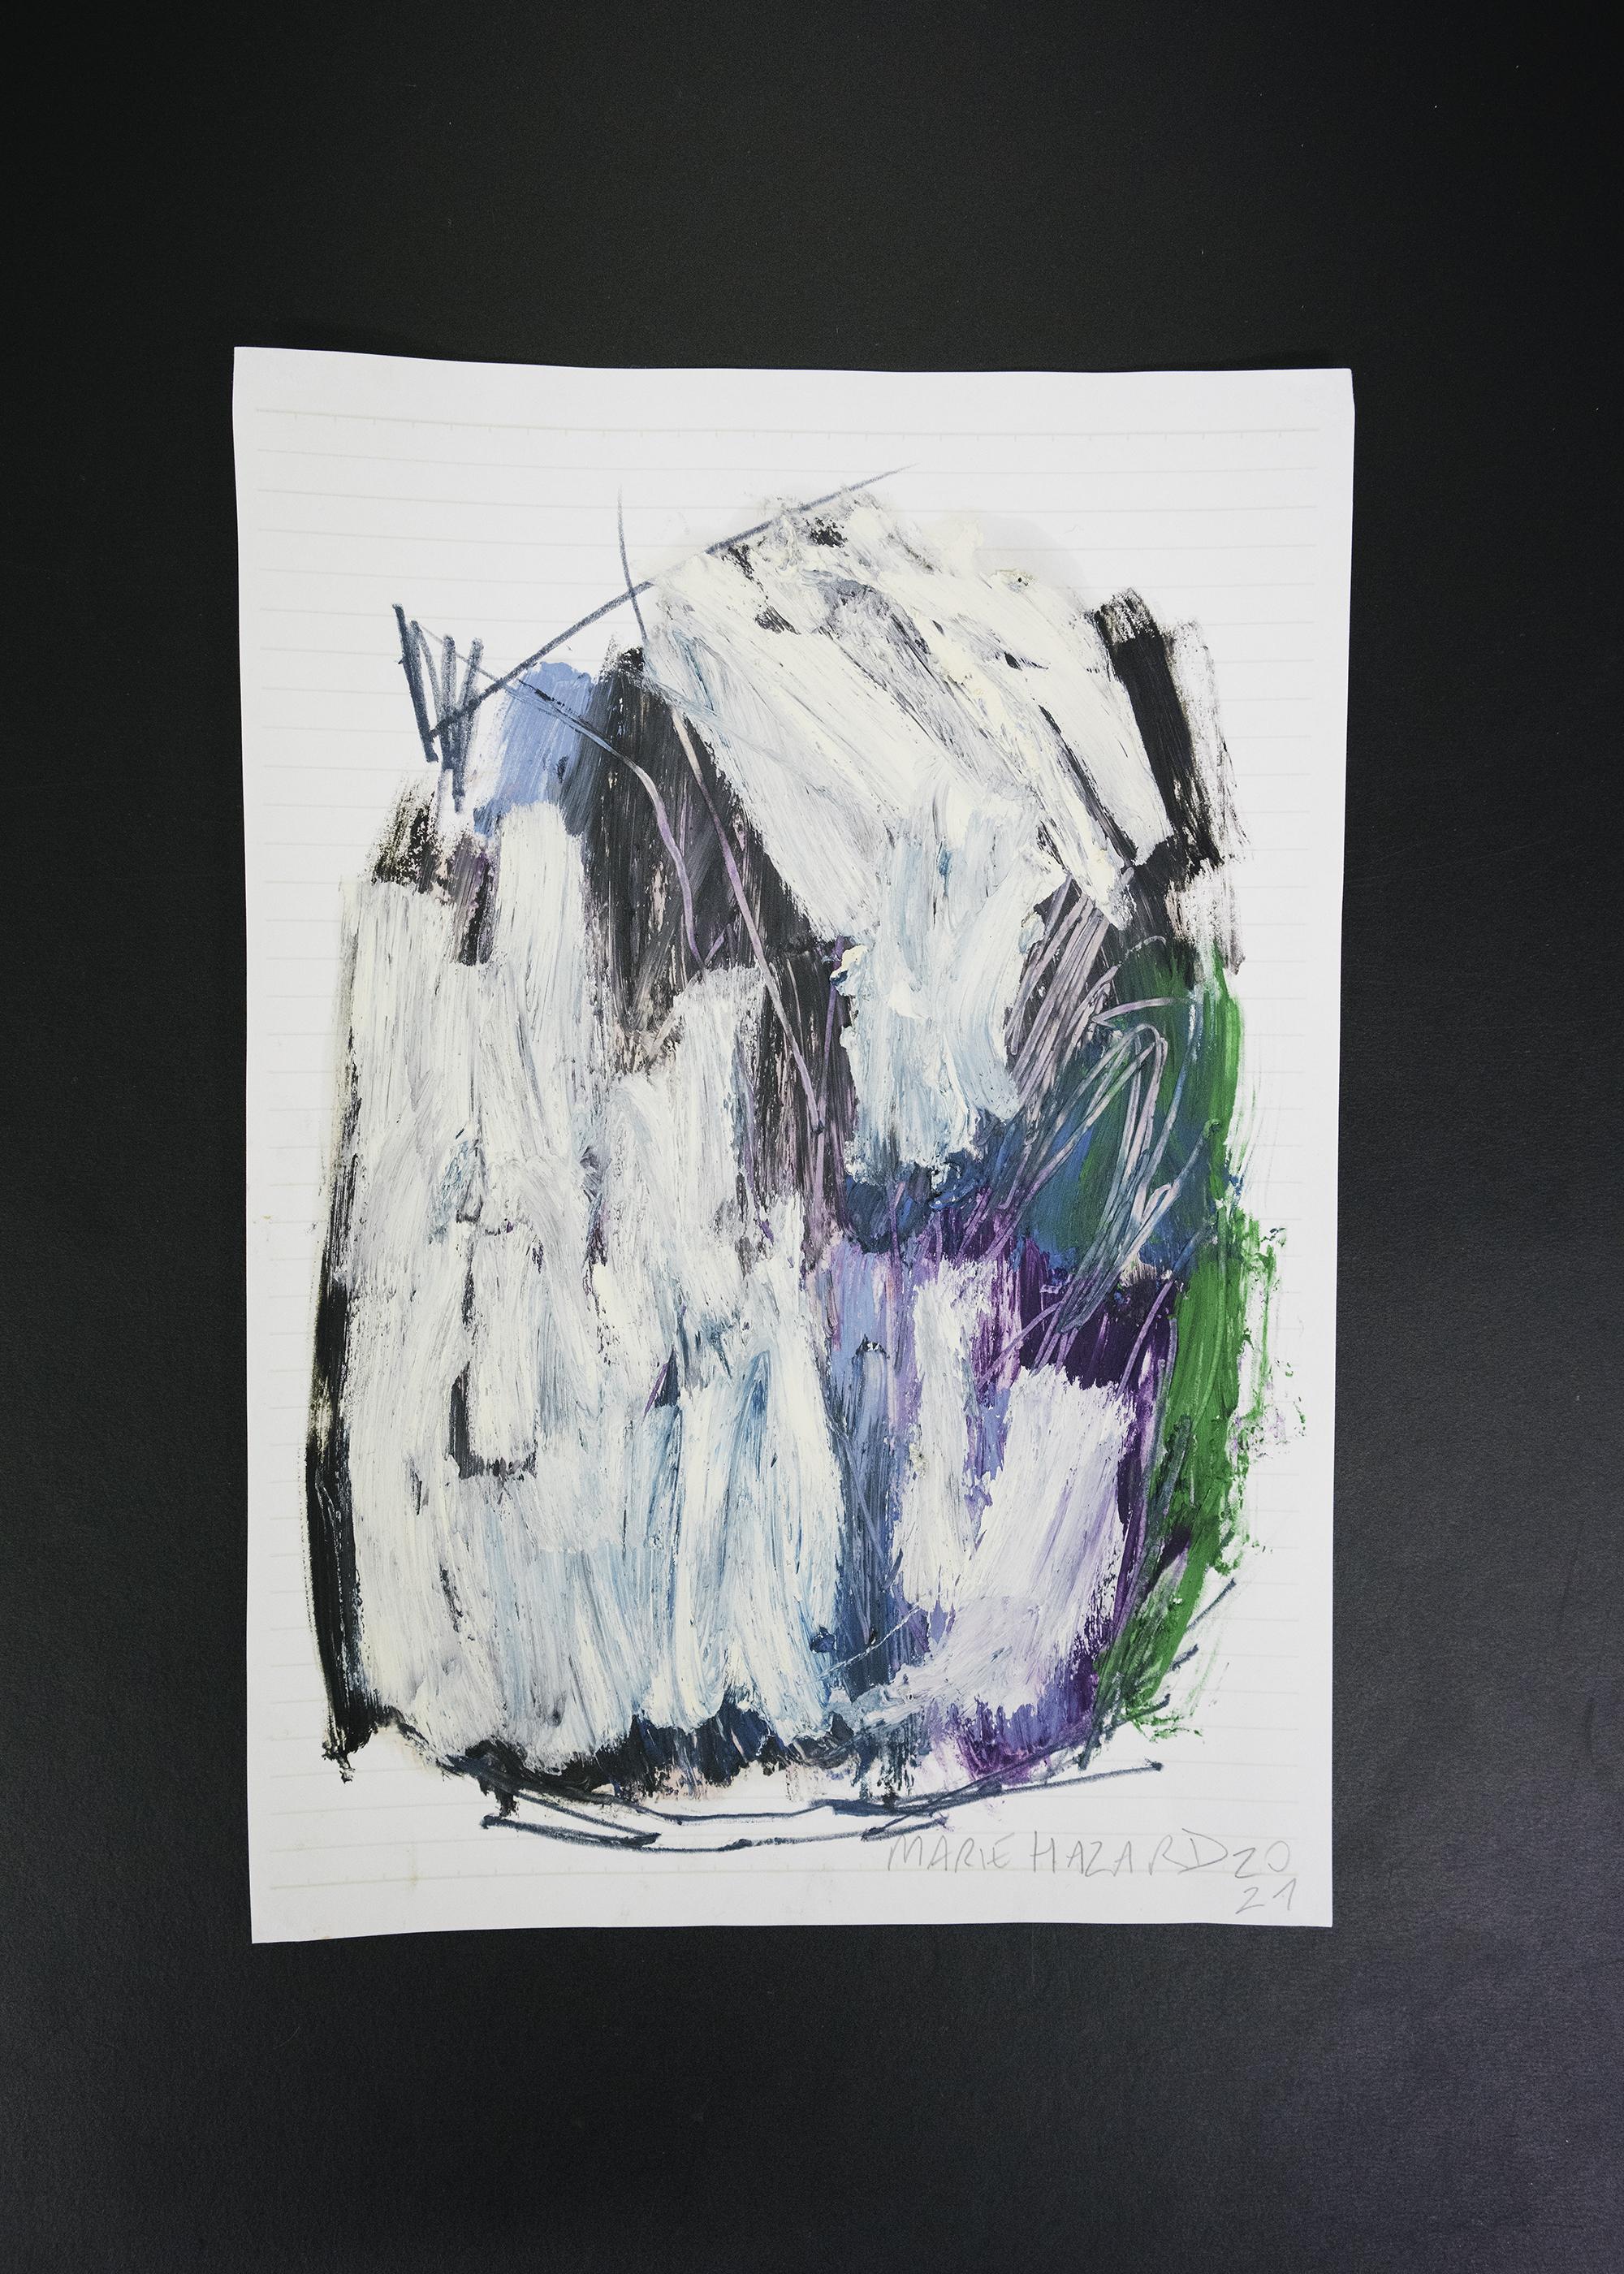 6 Marie Hazard < étude for my single cosmos >> 2021 - Oil sticks on paper Unique 24 x 16,5 cm